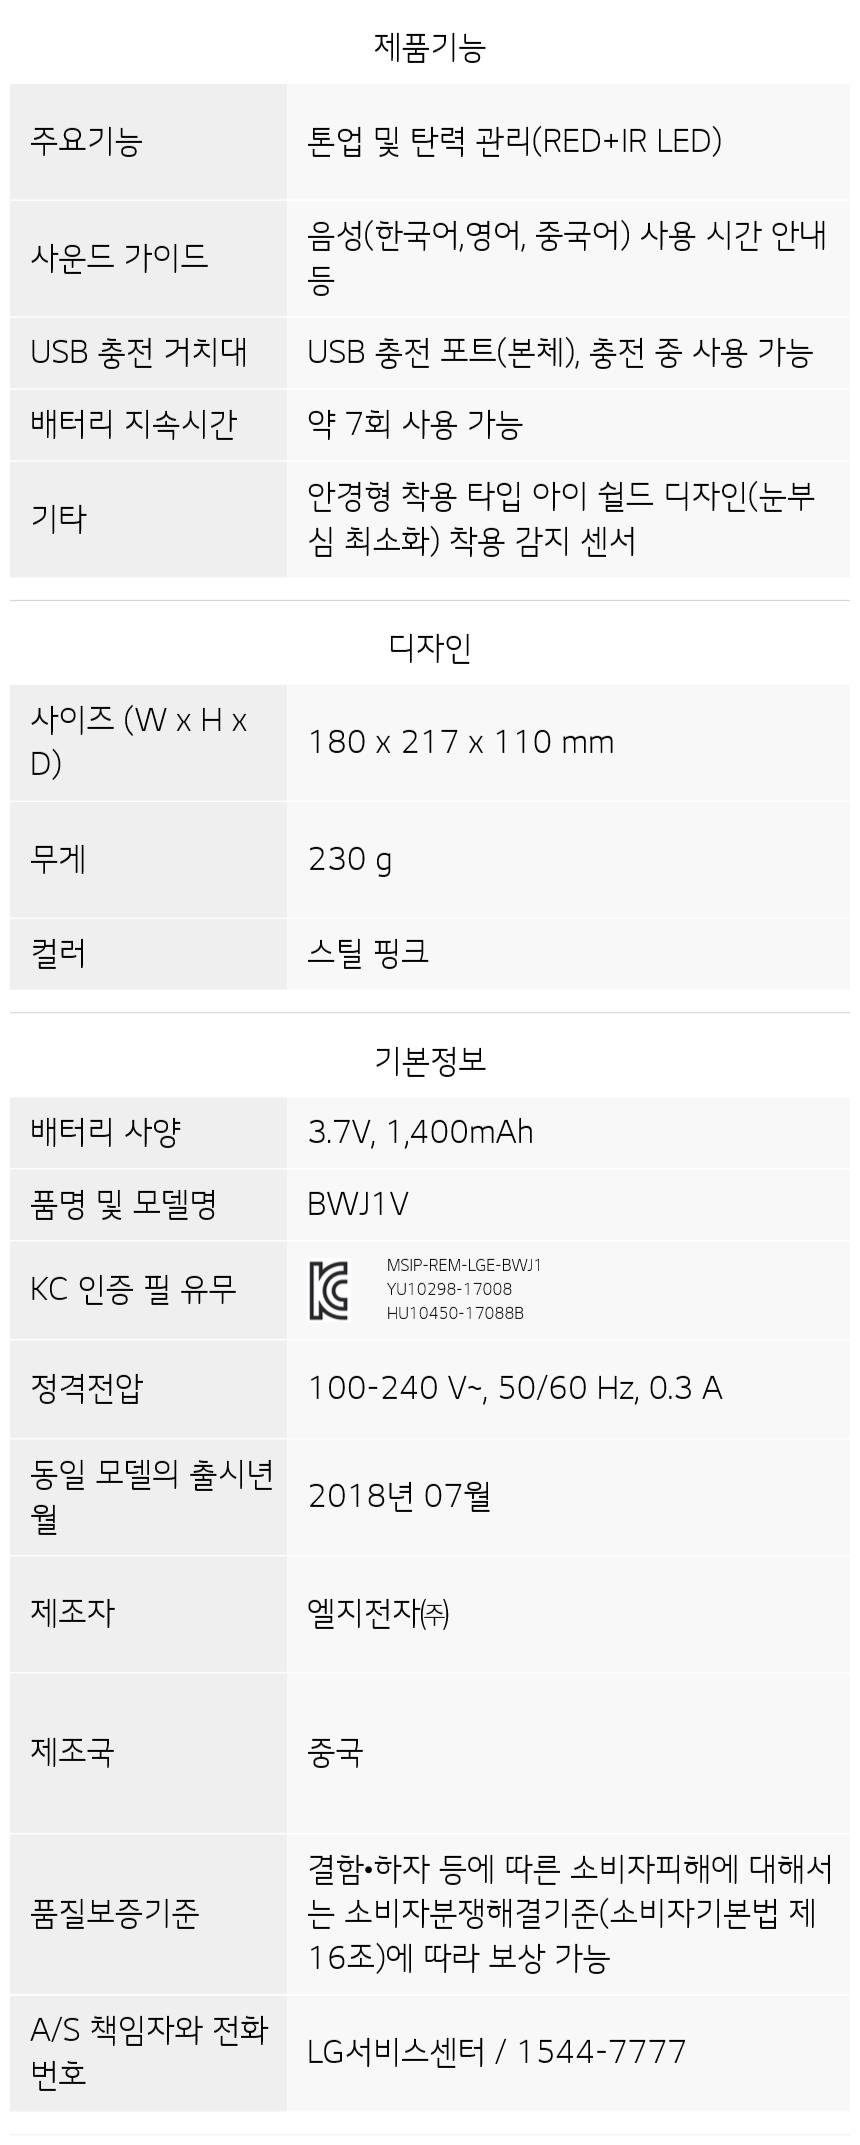 BWJ1V 제품 사양